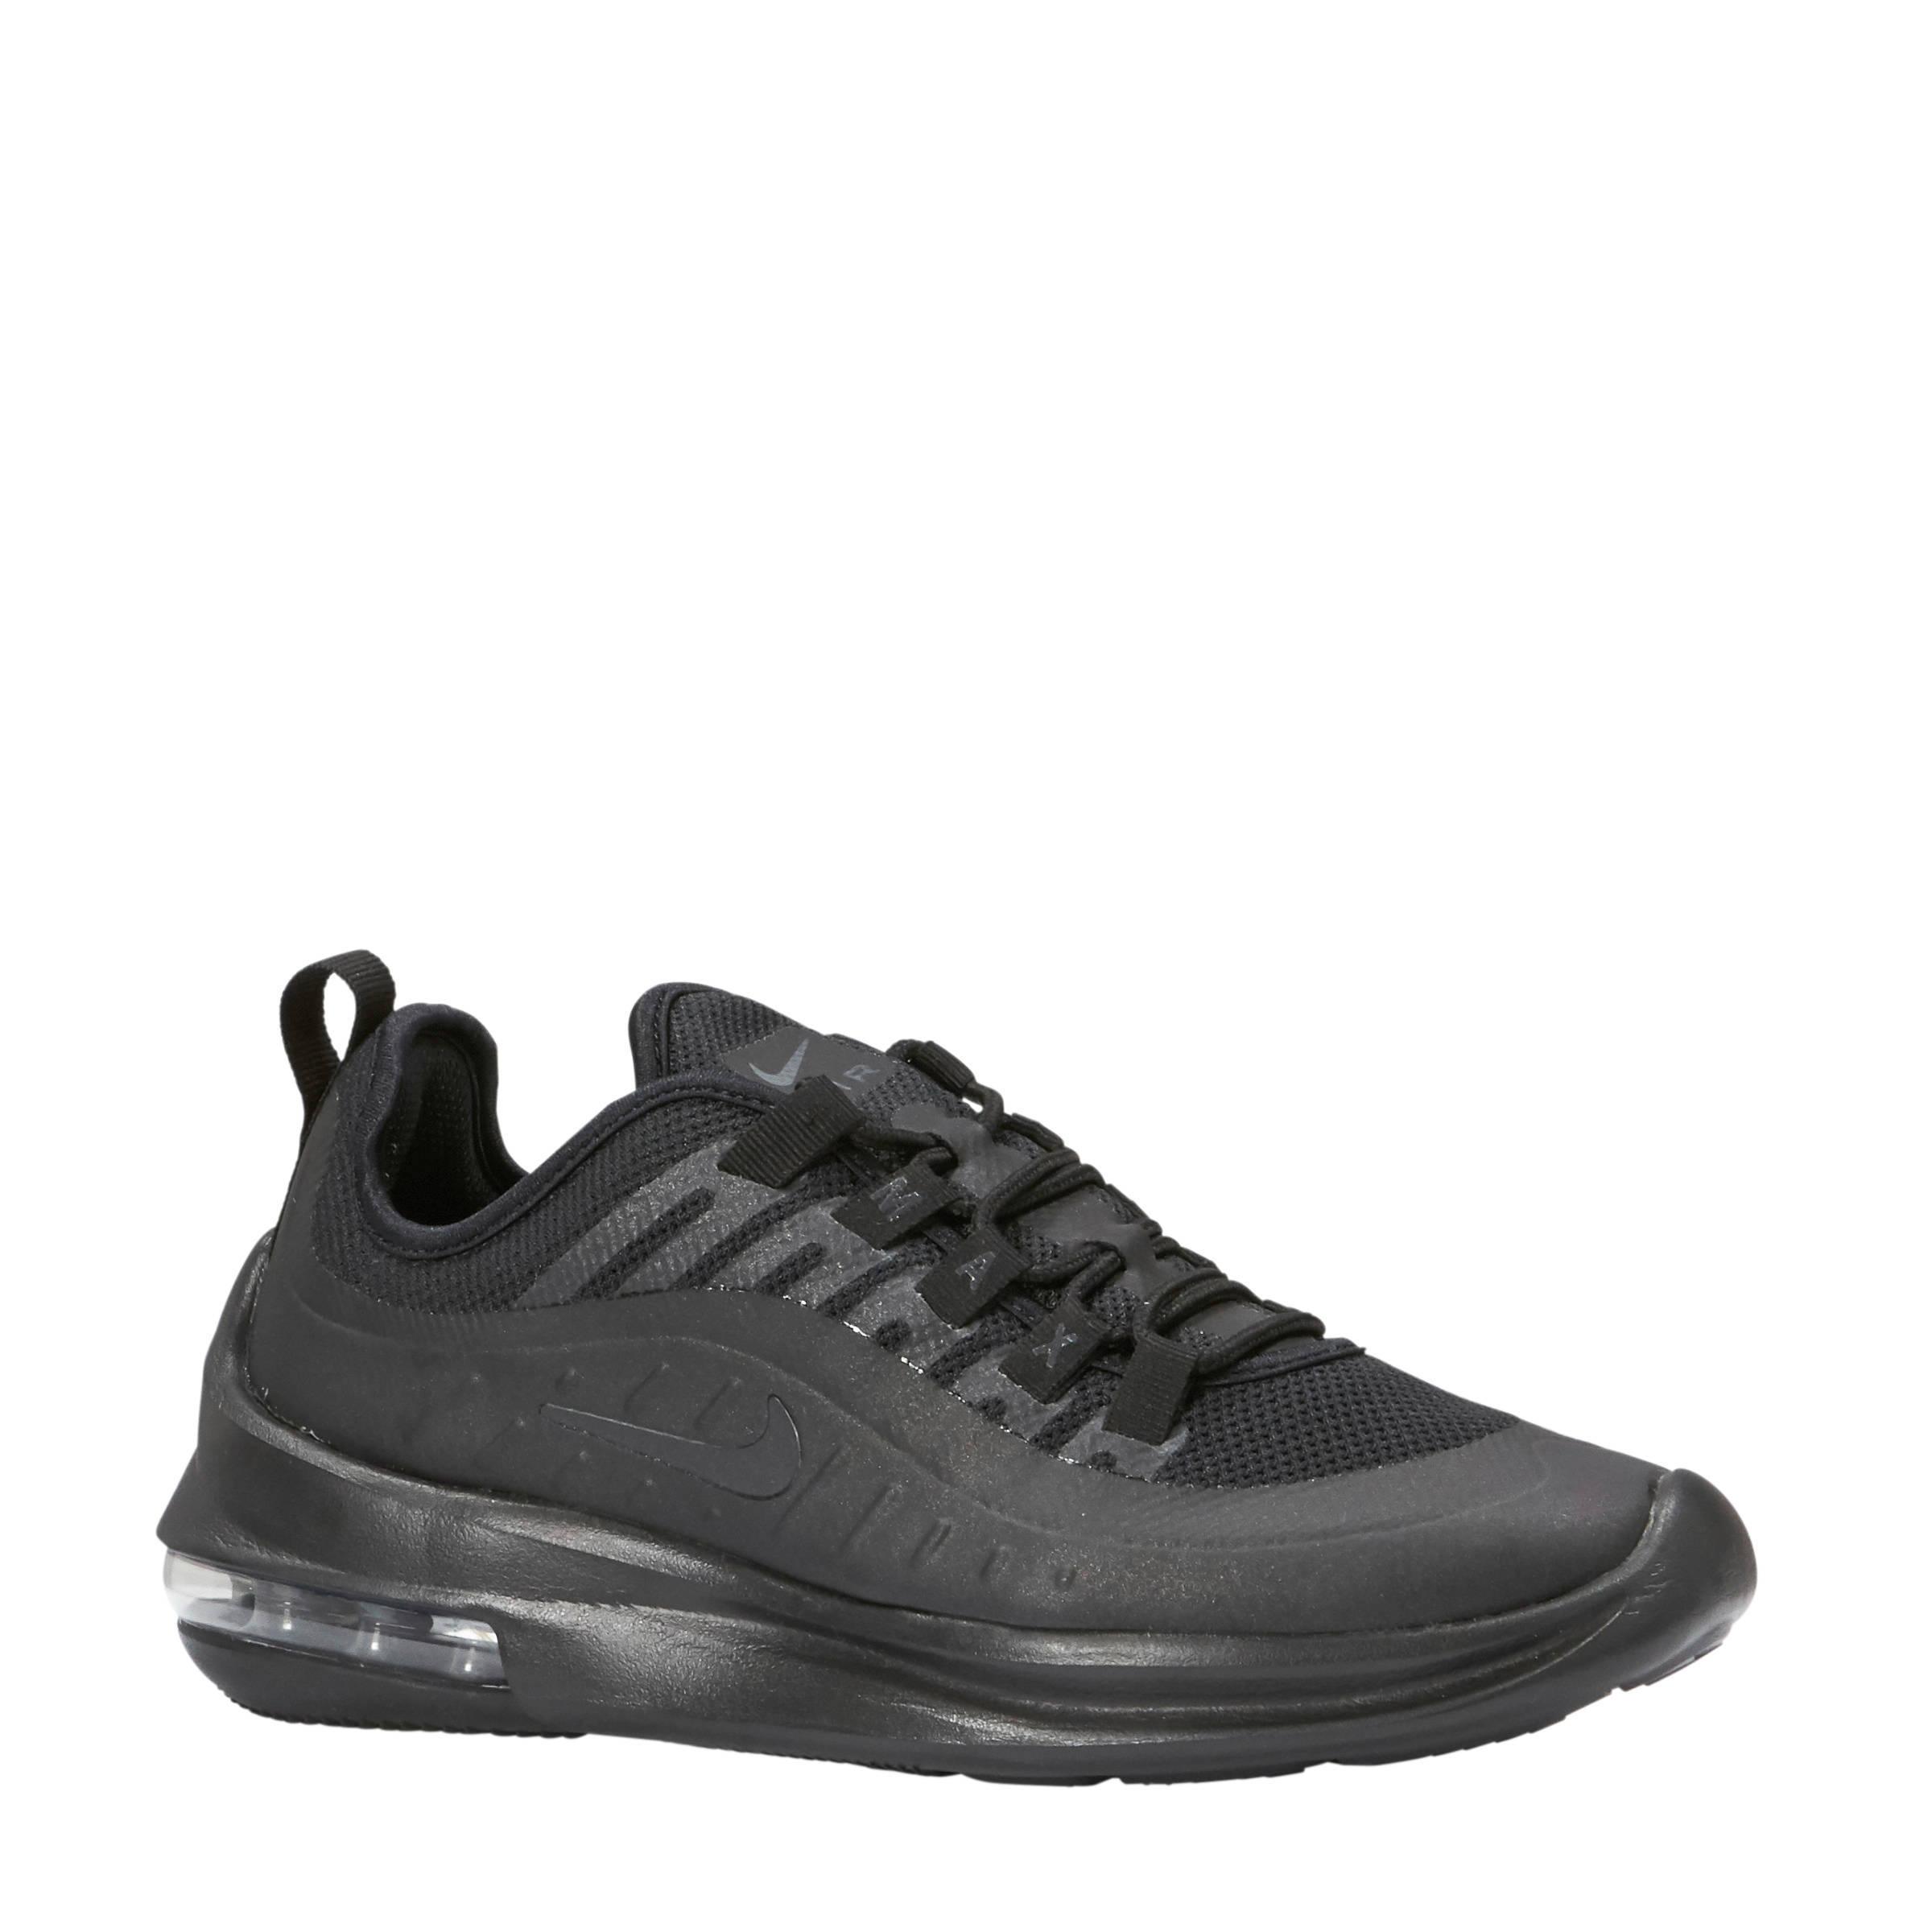 7d85cc26661 nike-air-max-axis-sneakers-zwart-zwart-0884751363672.jpg